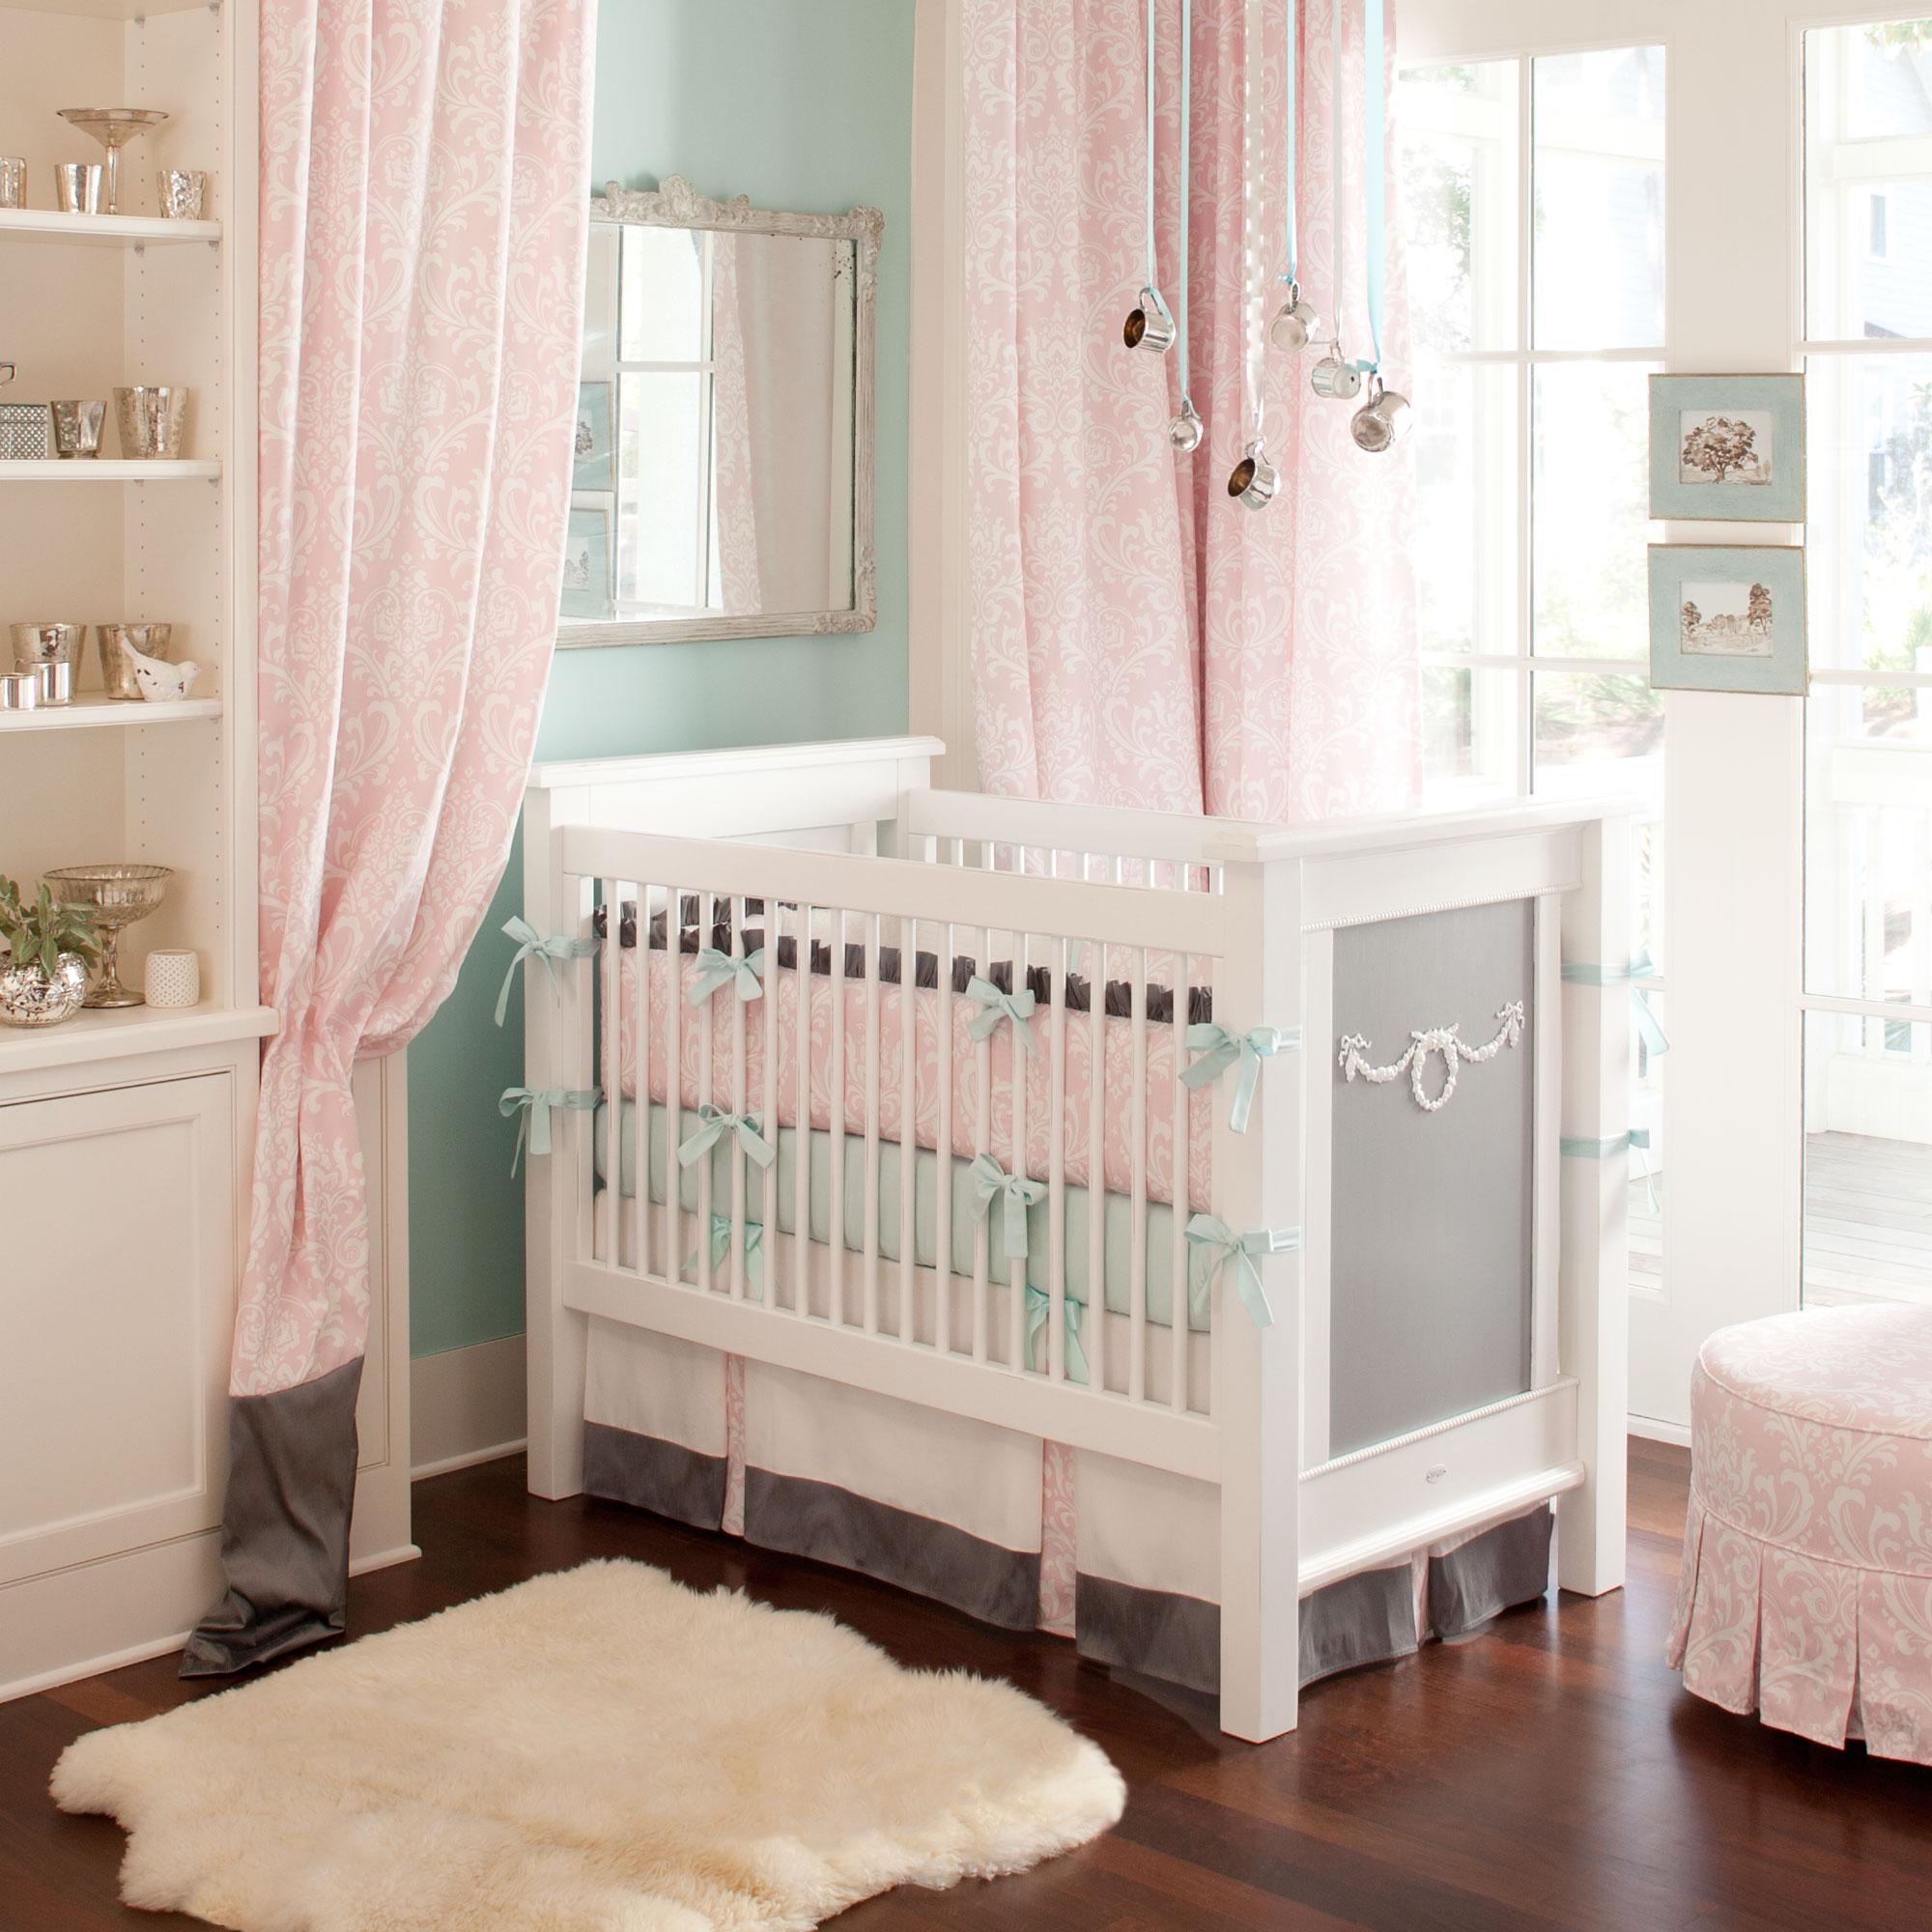 Light pink curtains - Baby Curtains And Bedding Set Curtain Menzilperde Net Surprising Light Pink